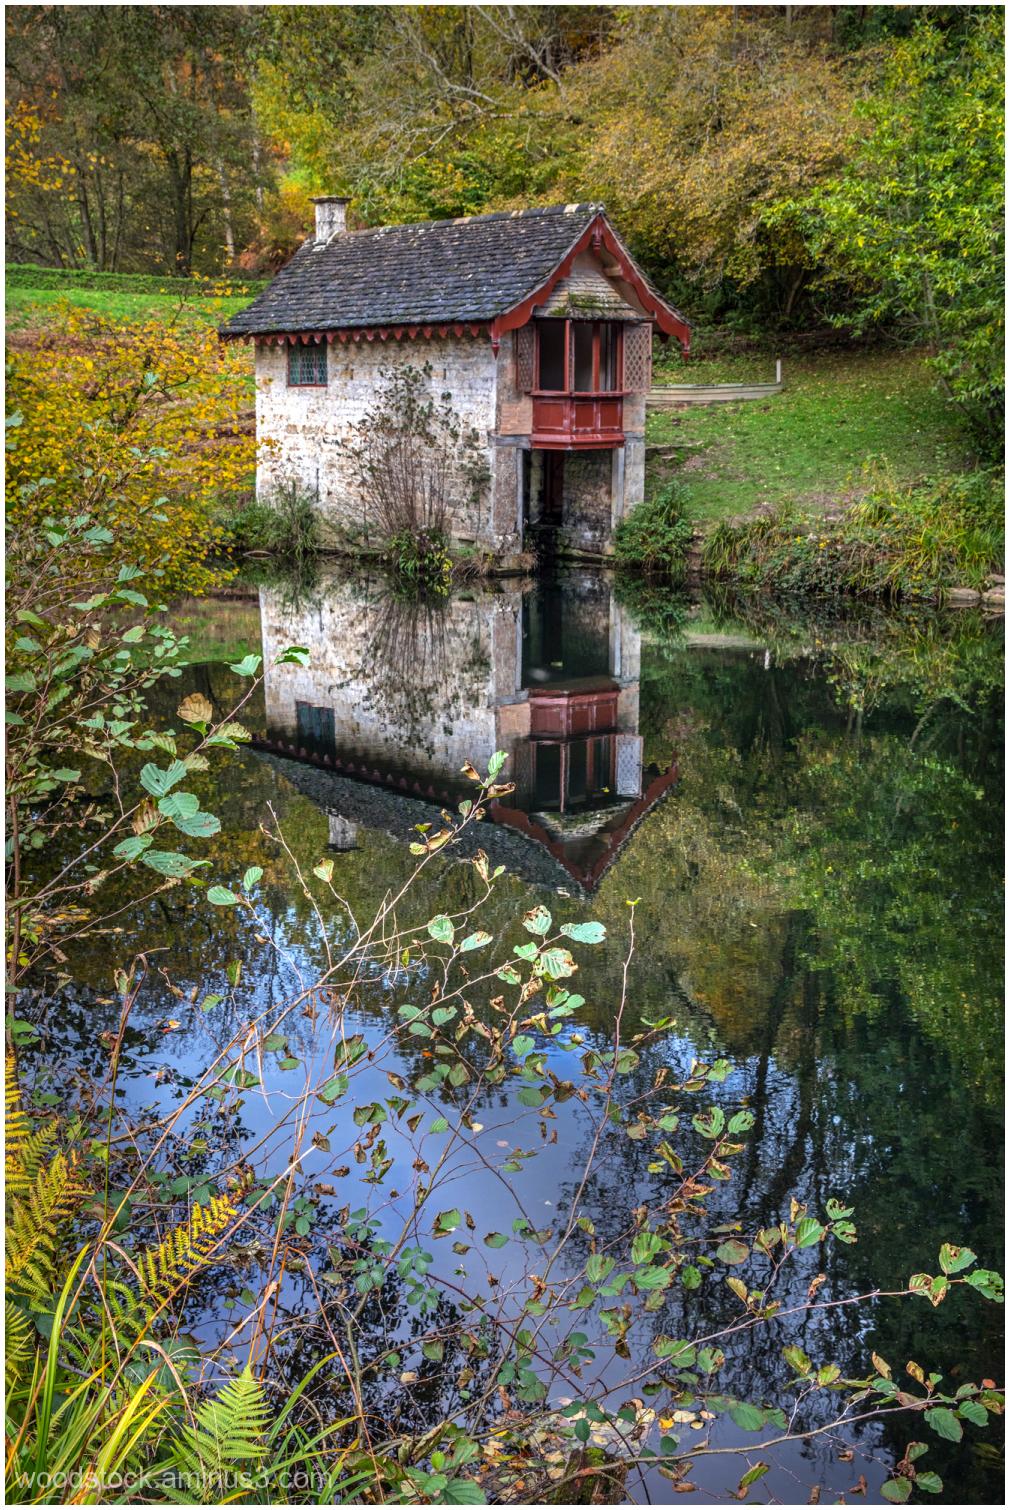 Woodchester Park